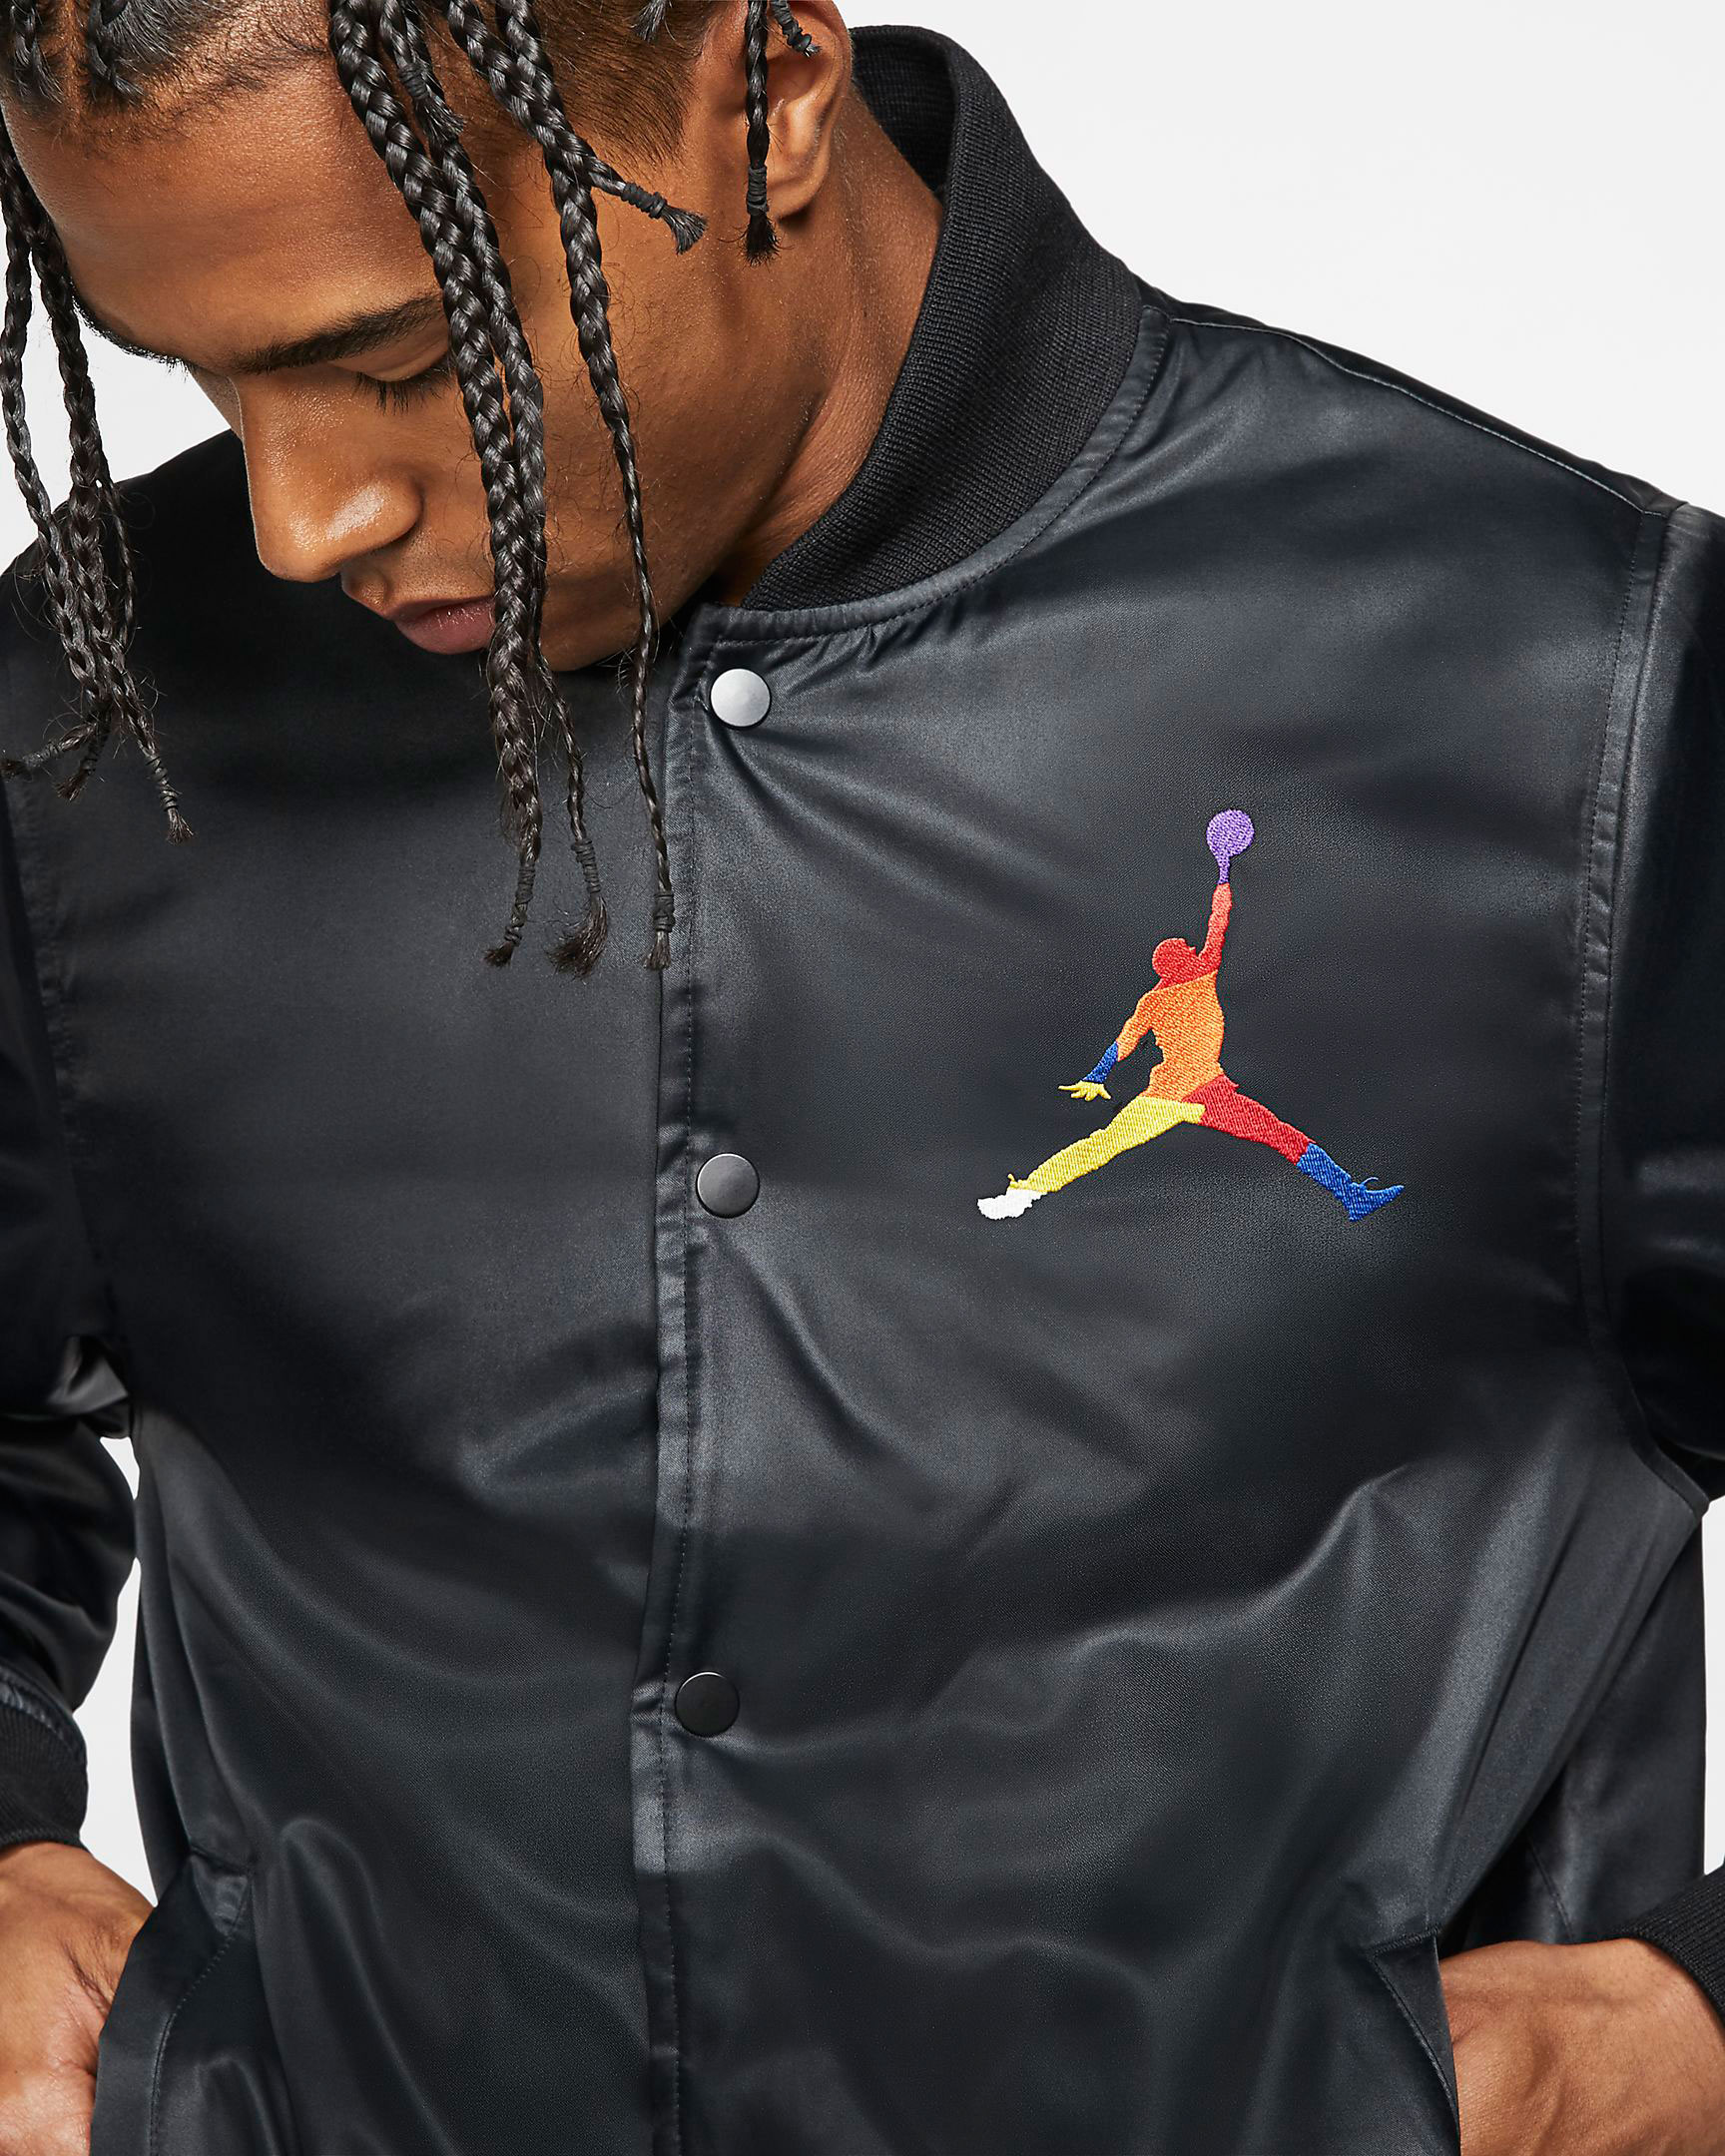 air-jordan-3-knicks-rivals-jacket-3